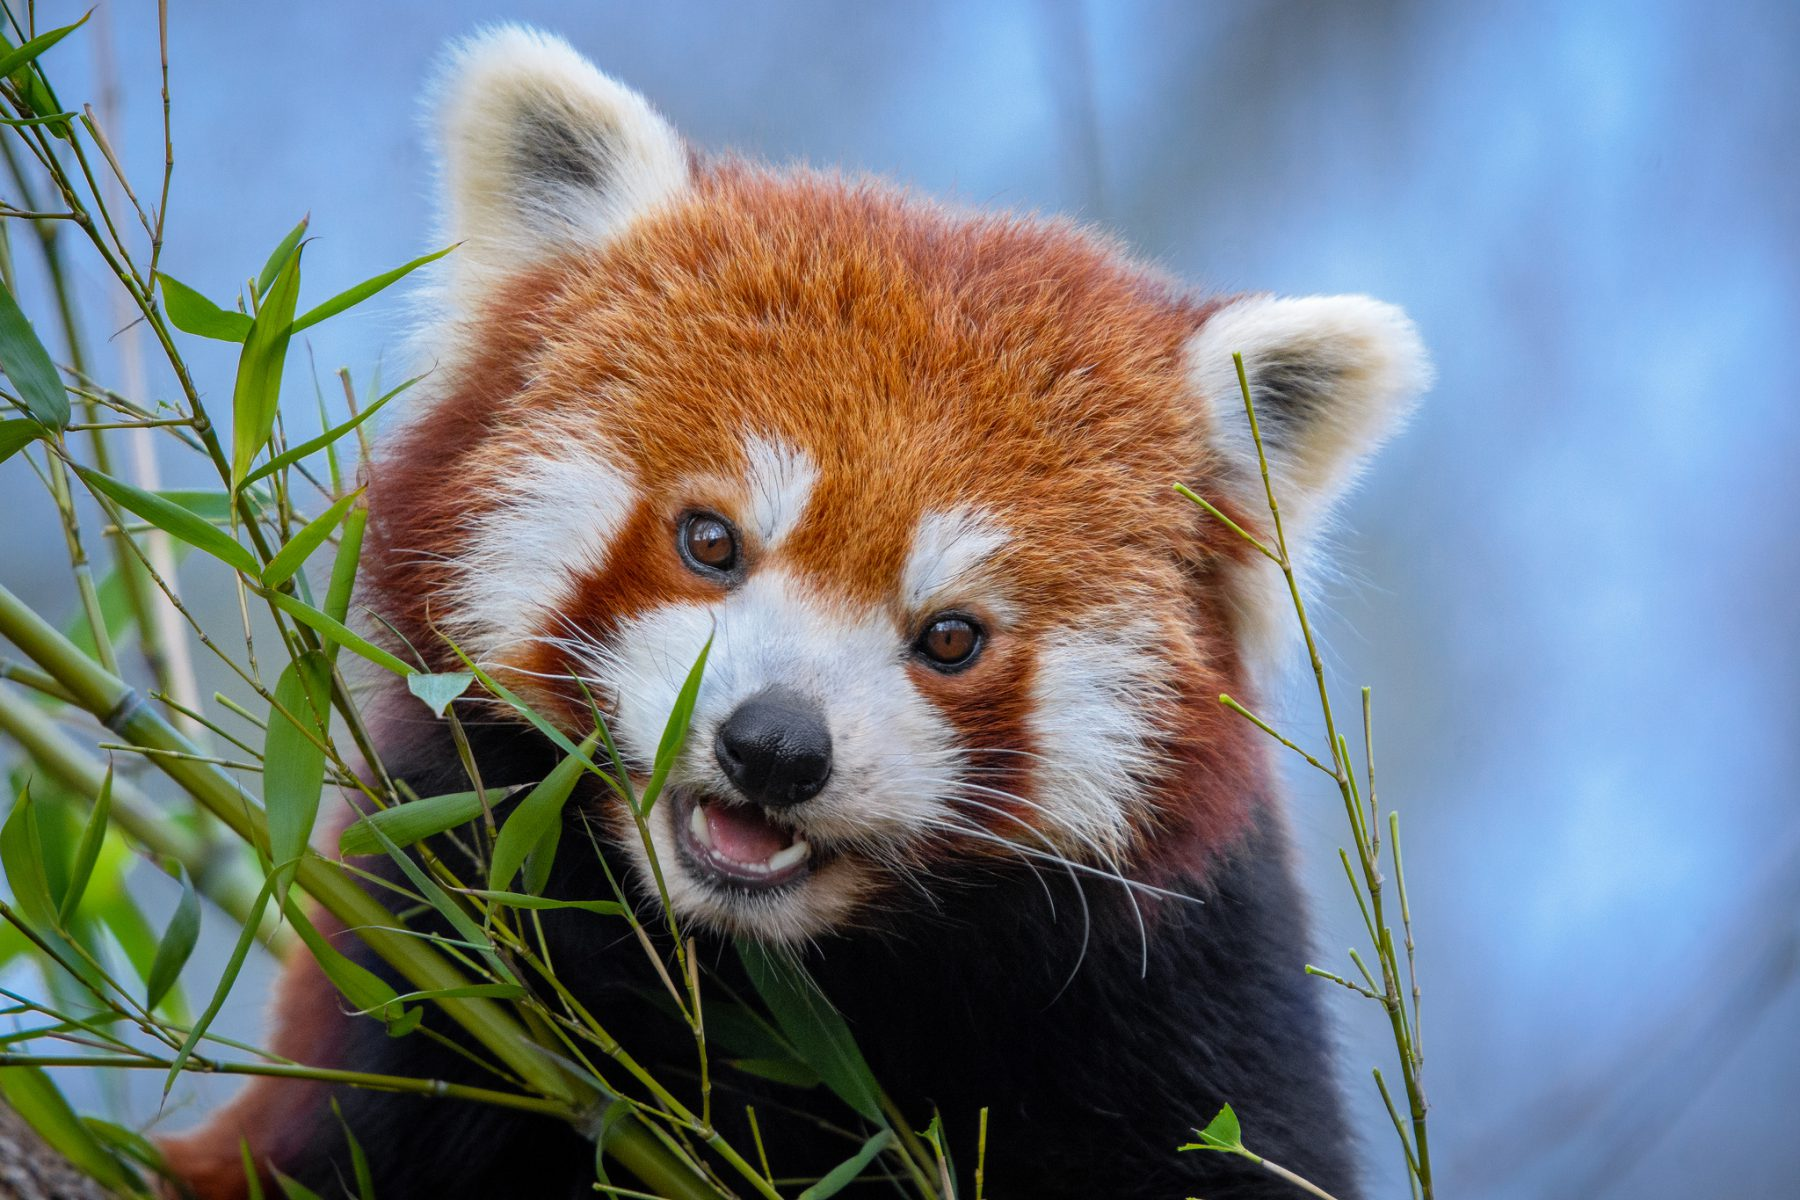 A red panda (Image: Mathias Appel)